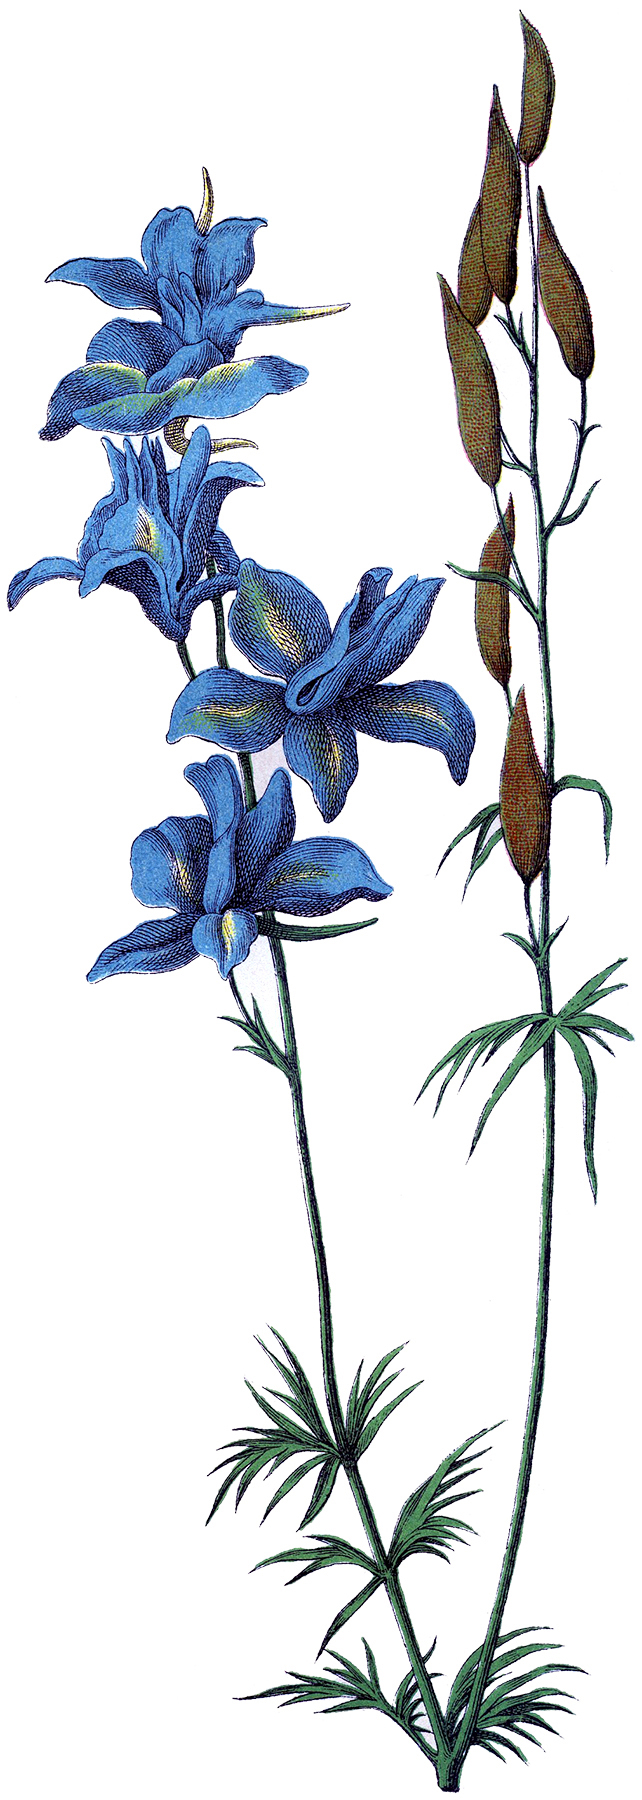 Beautiful Delphinium Flower Image! - The Graphics Fairy